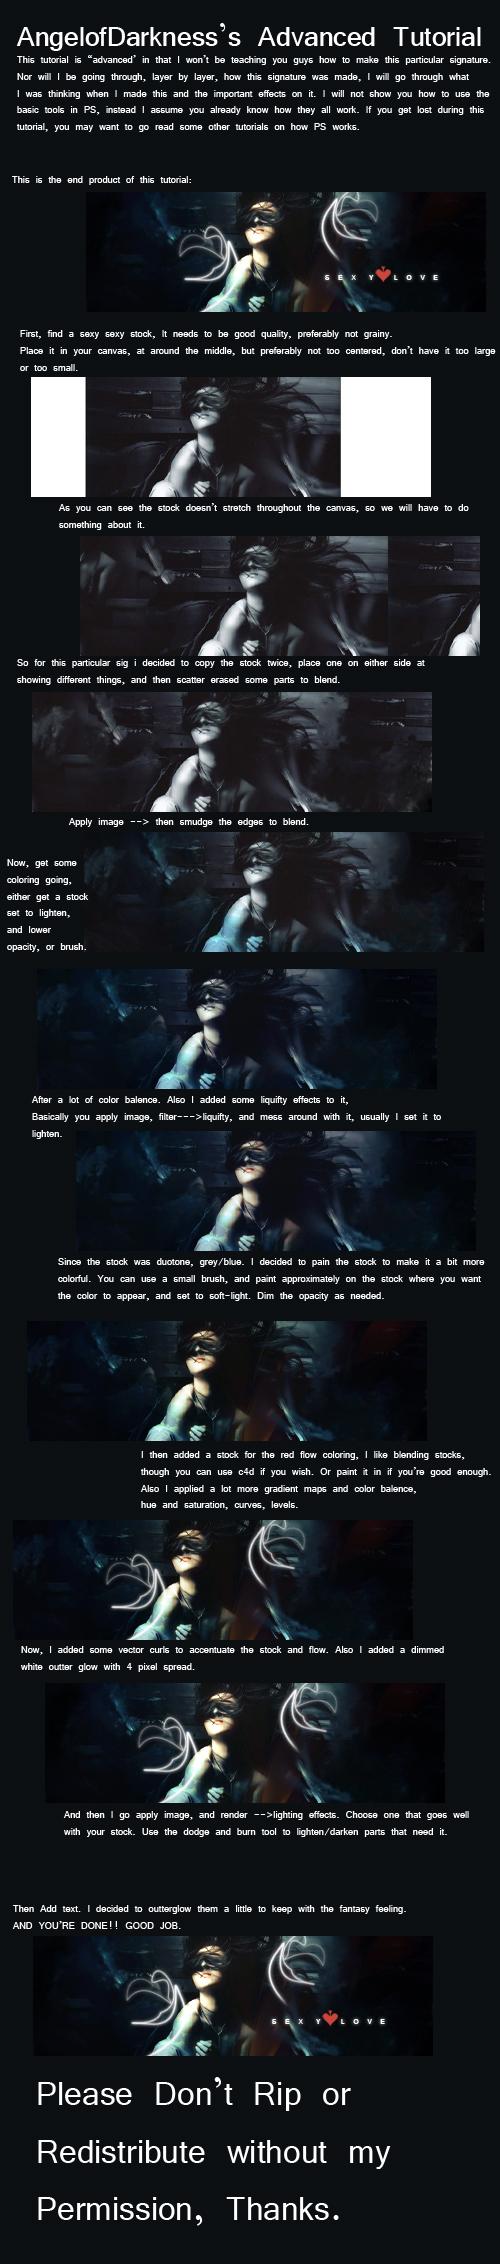 Angel of darkness signature tutorial